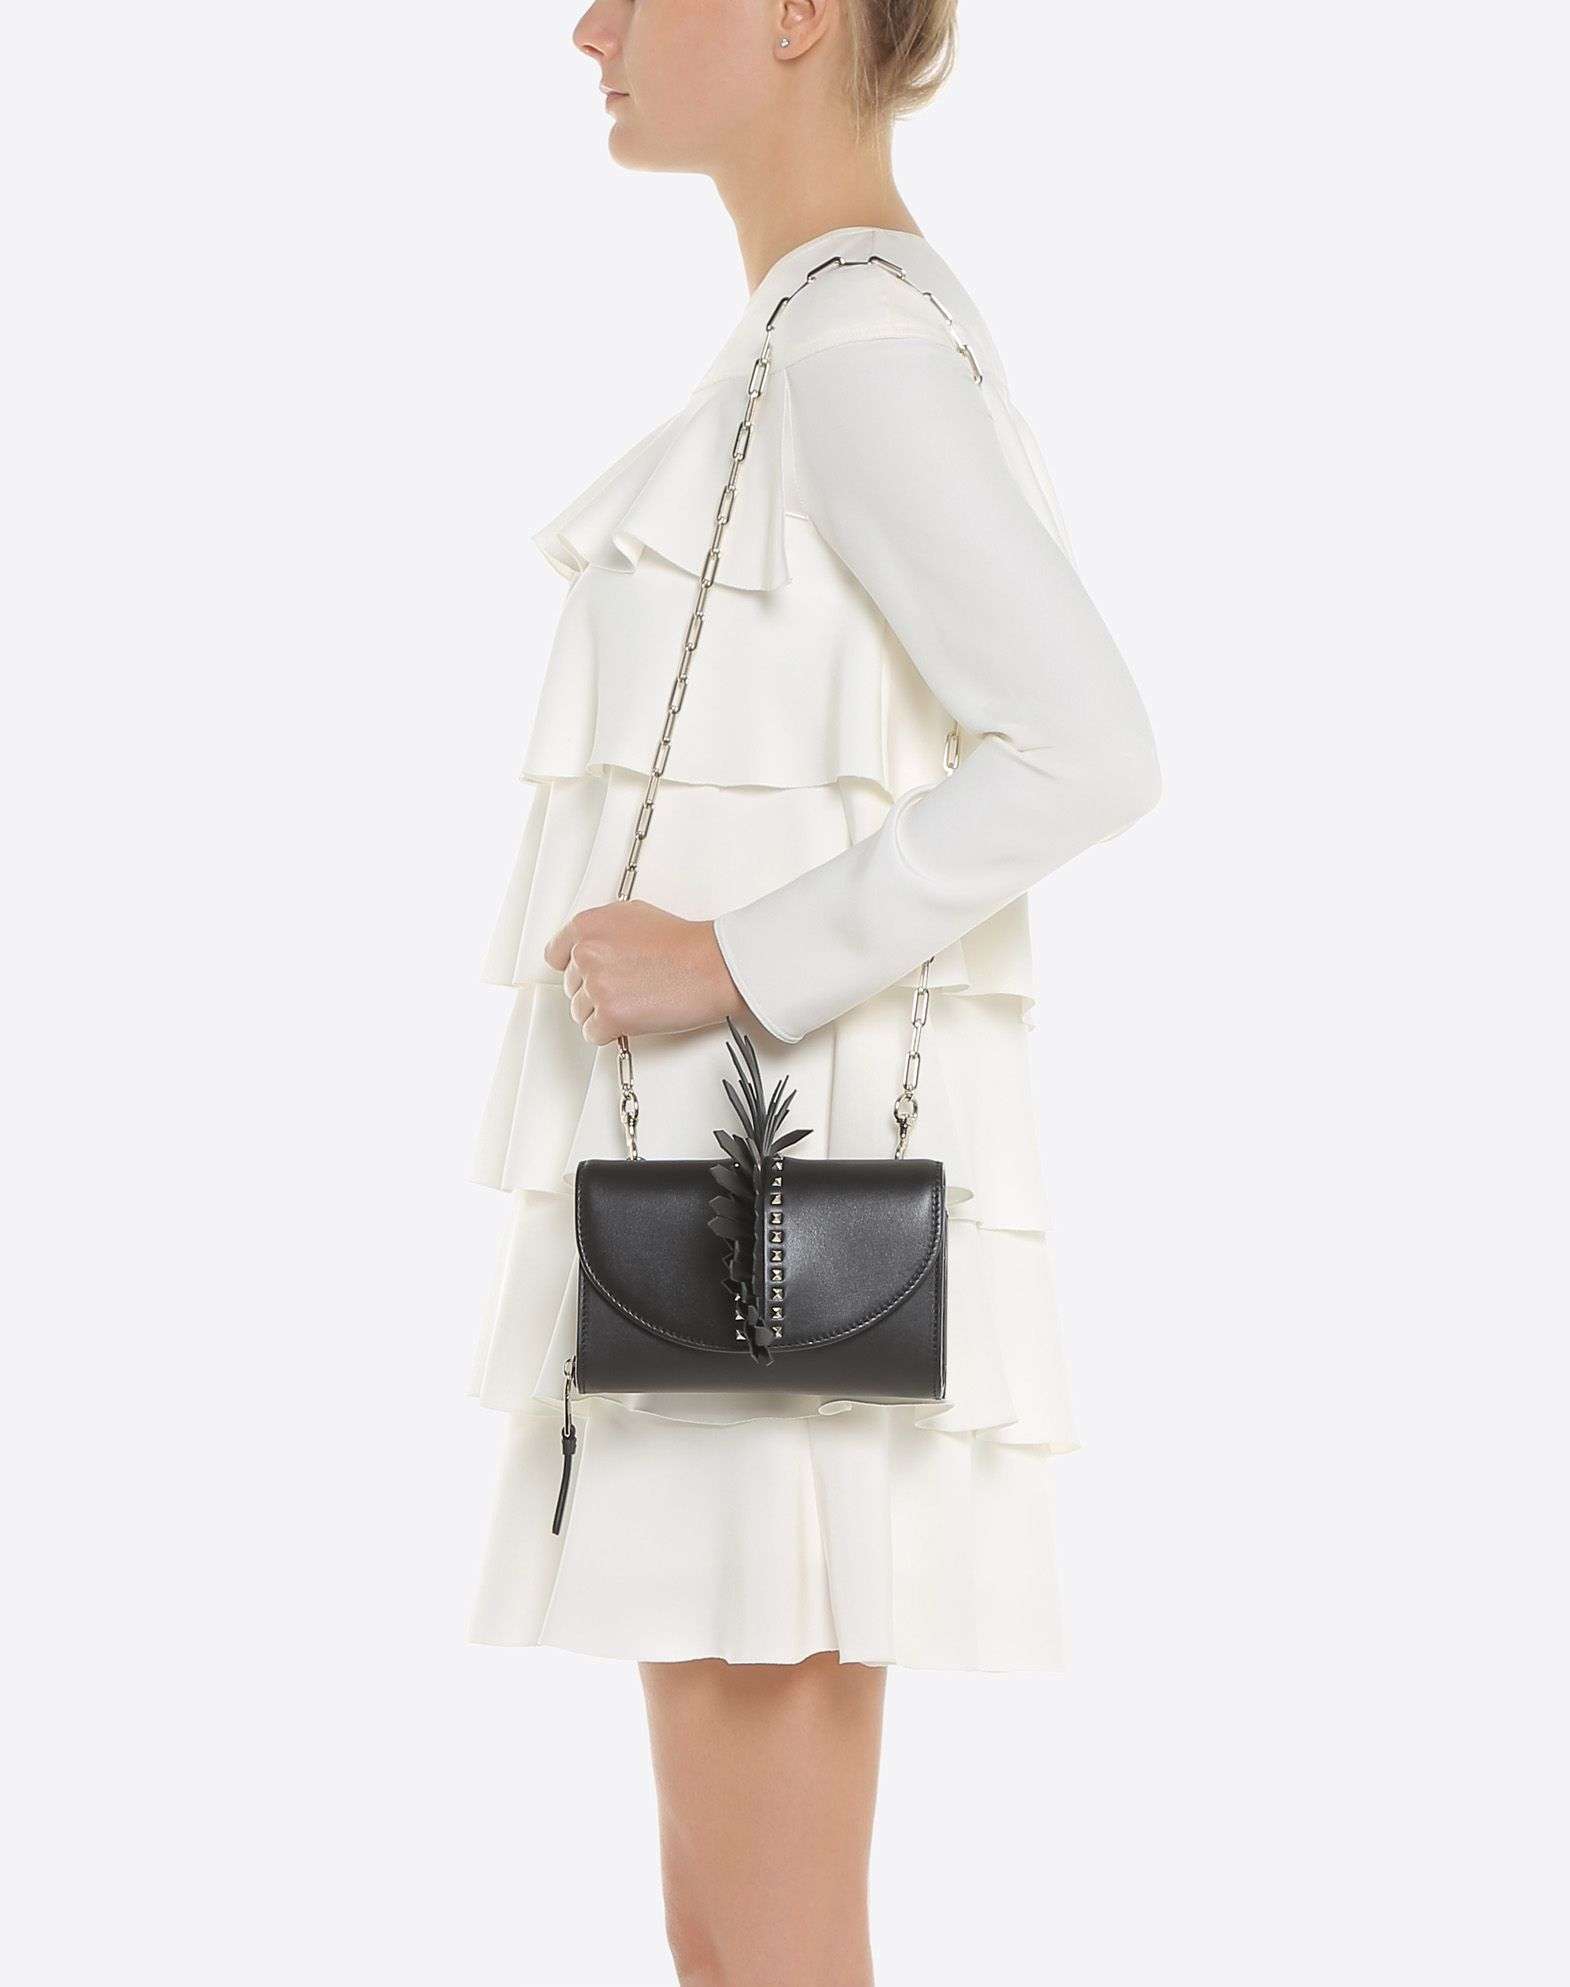 VALENTINO GARAVANI Shoulder Bag Shoulder bag D a